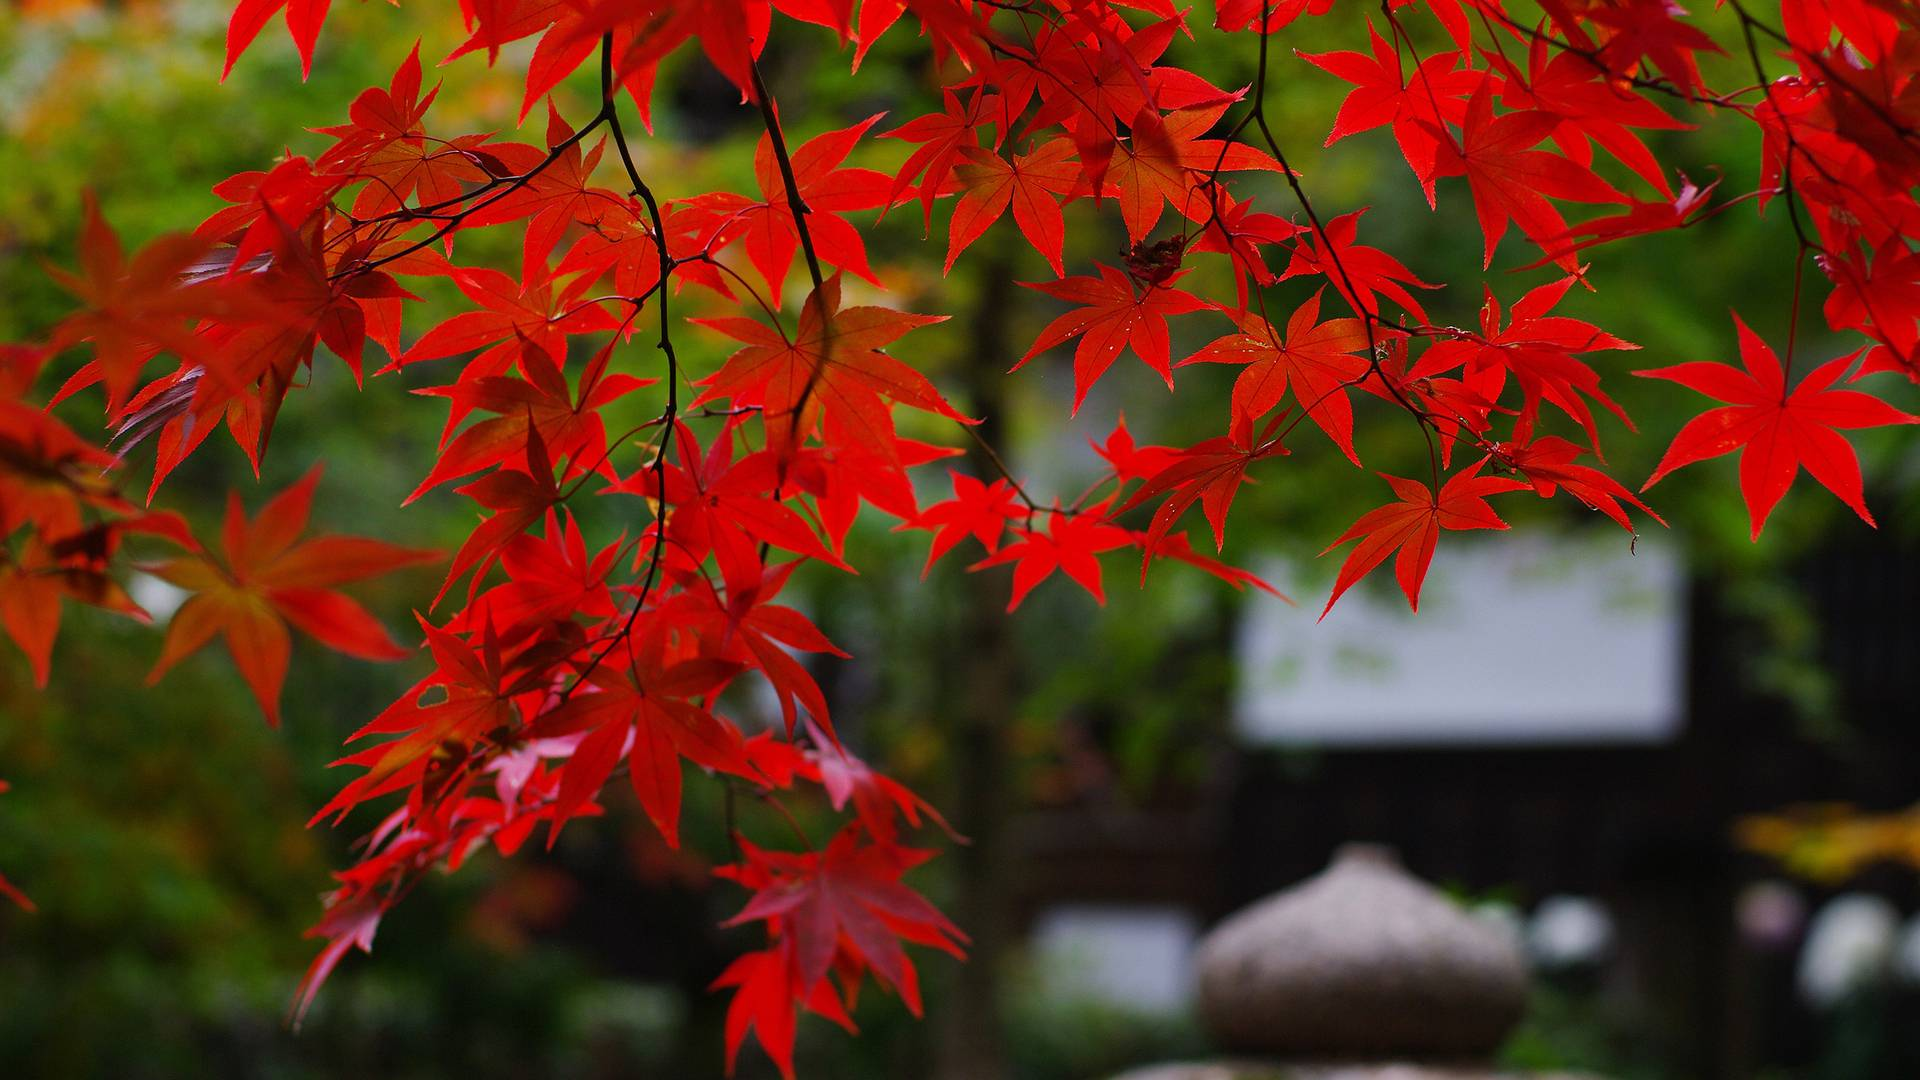 Red Autumn Leaf wallpaper.